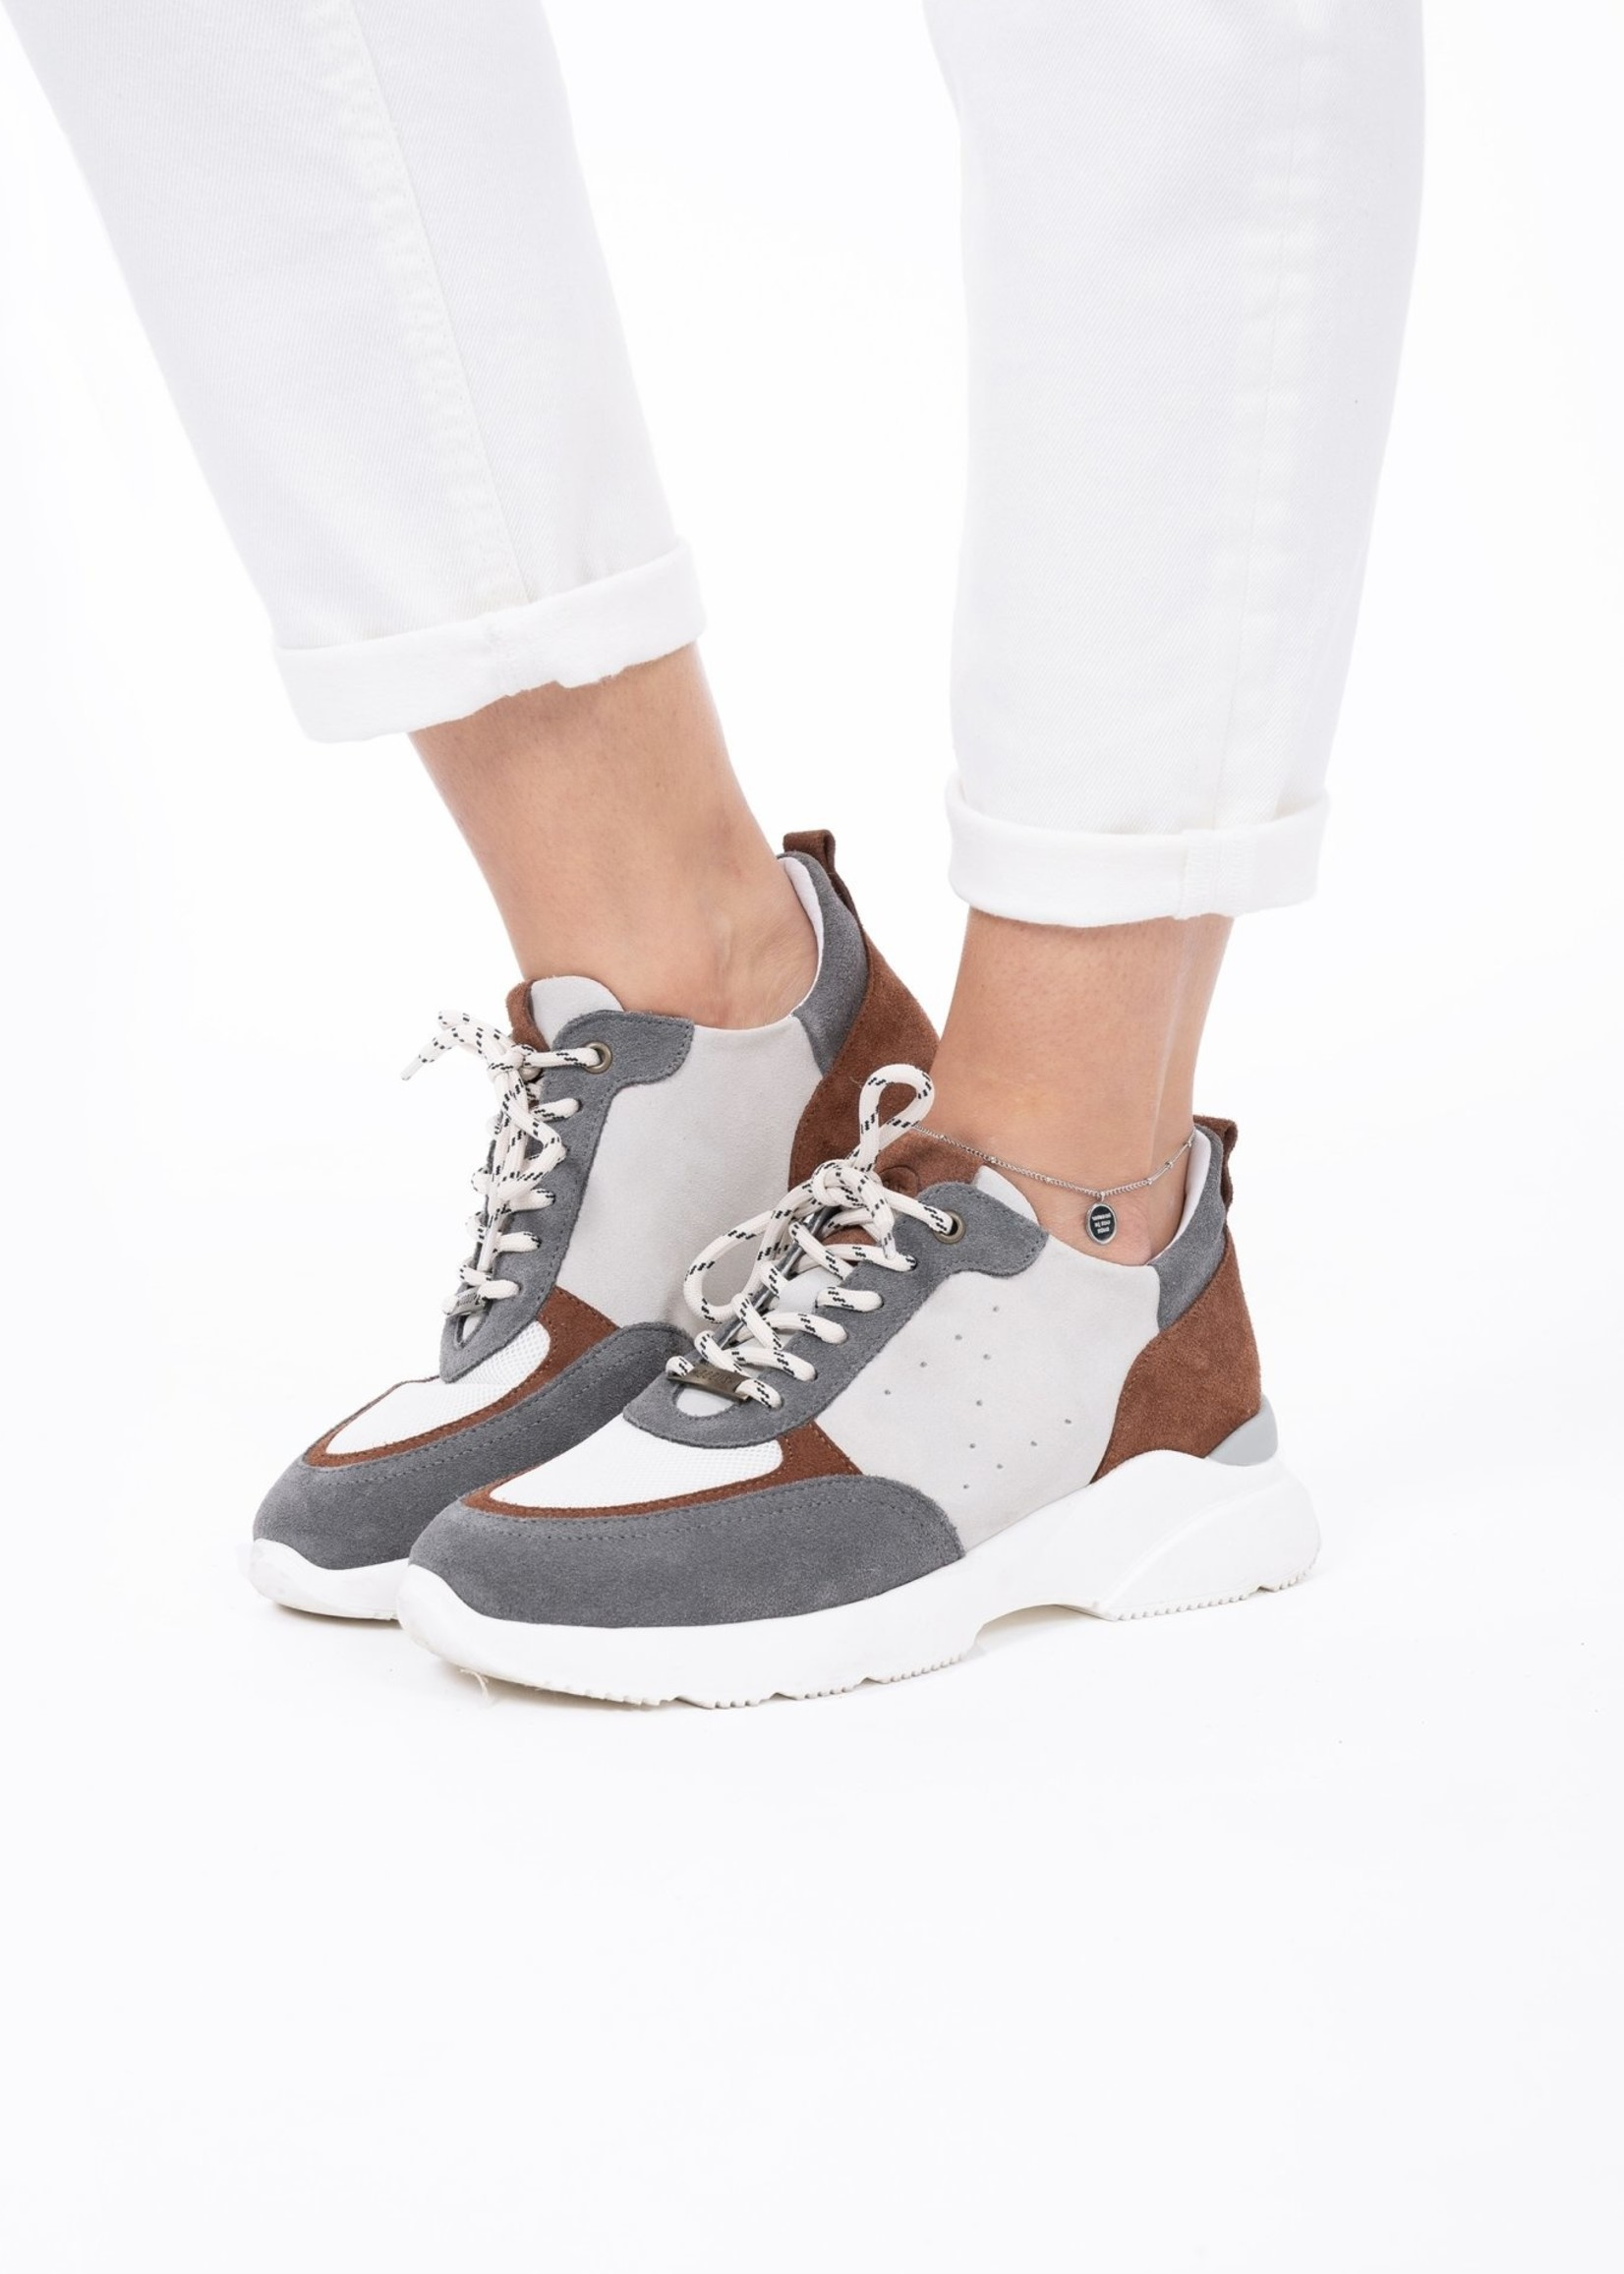 ZUSSS Gave sneaker gekleurd